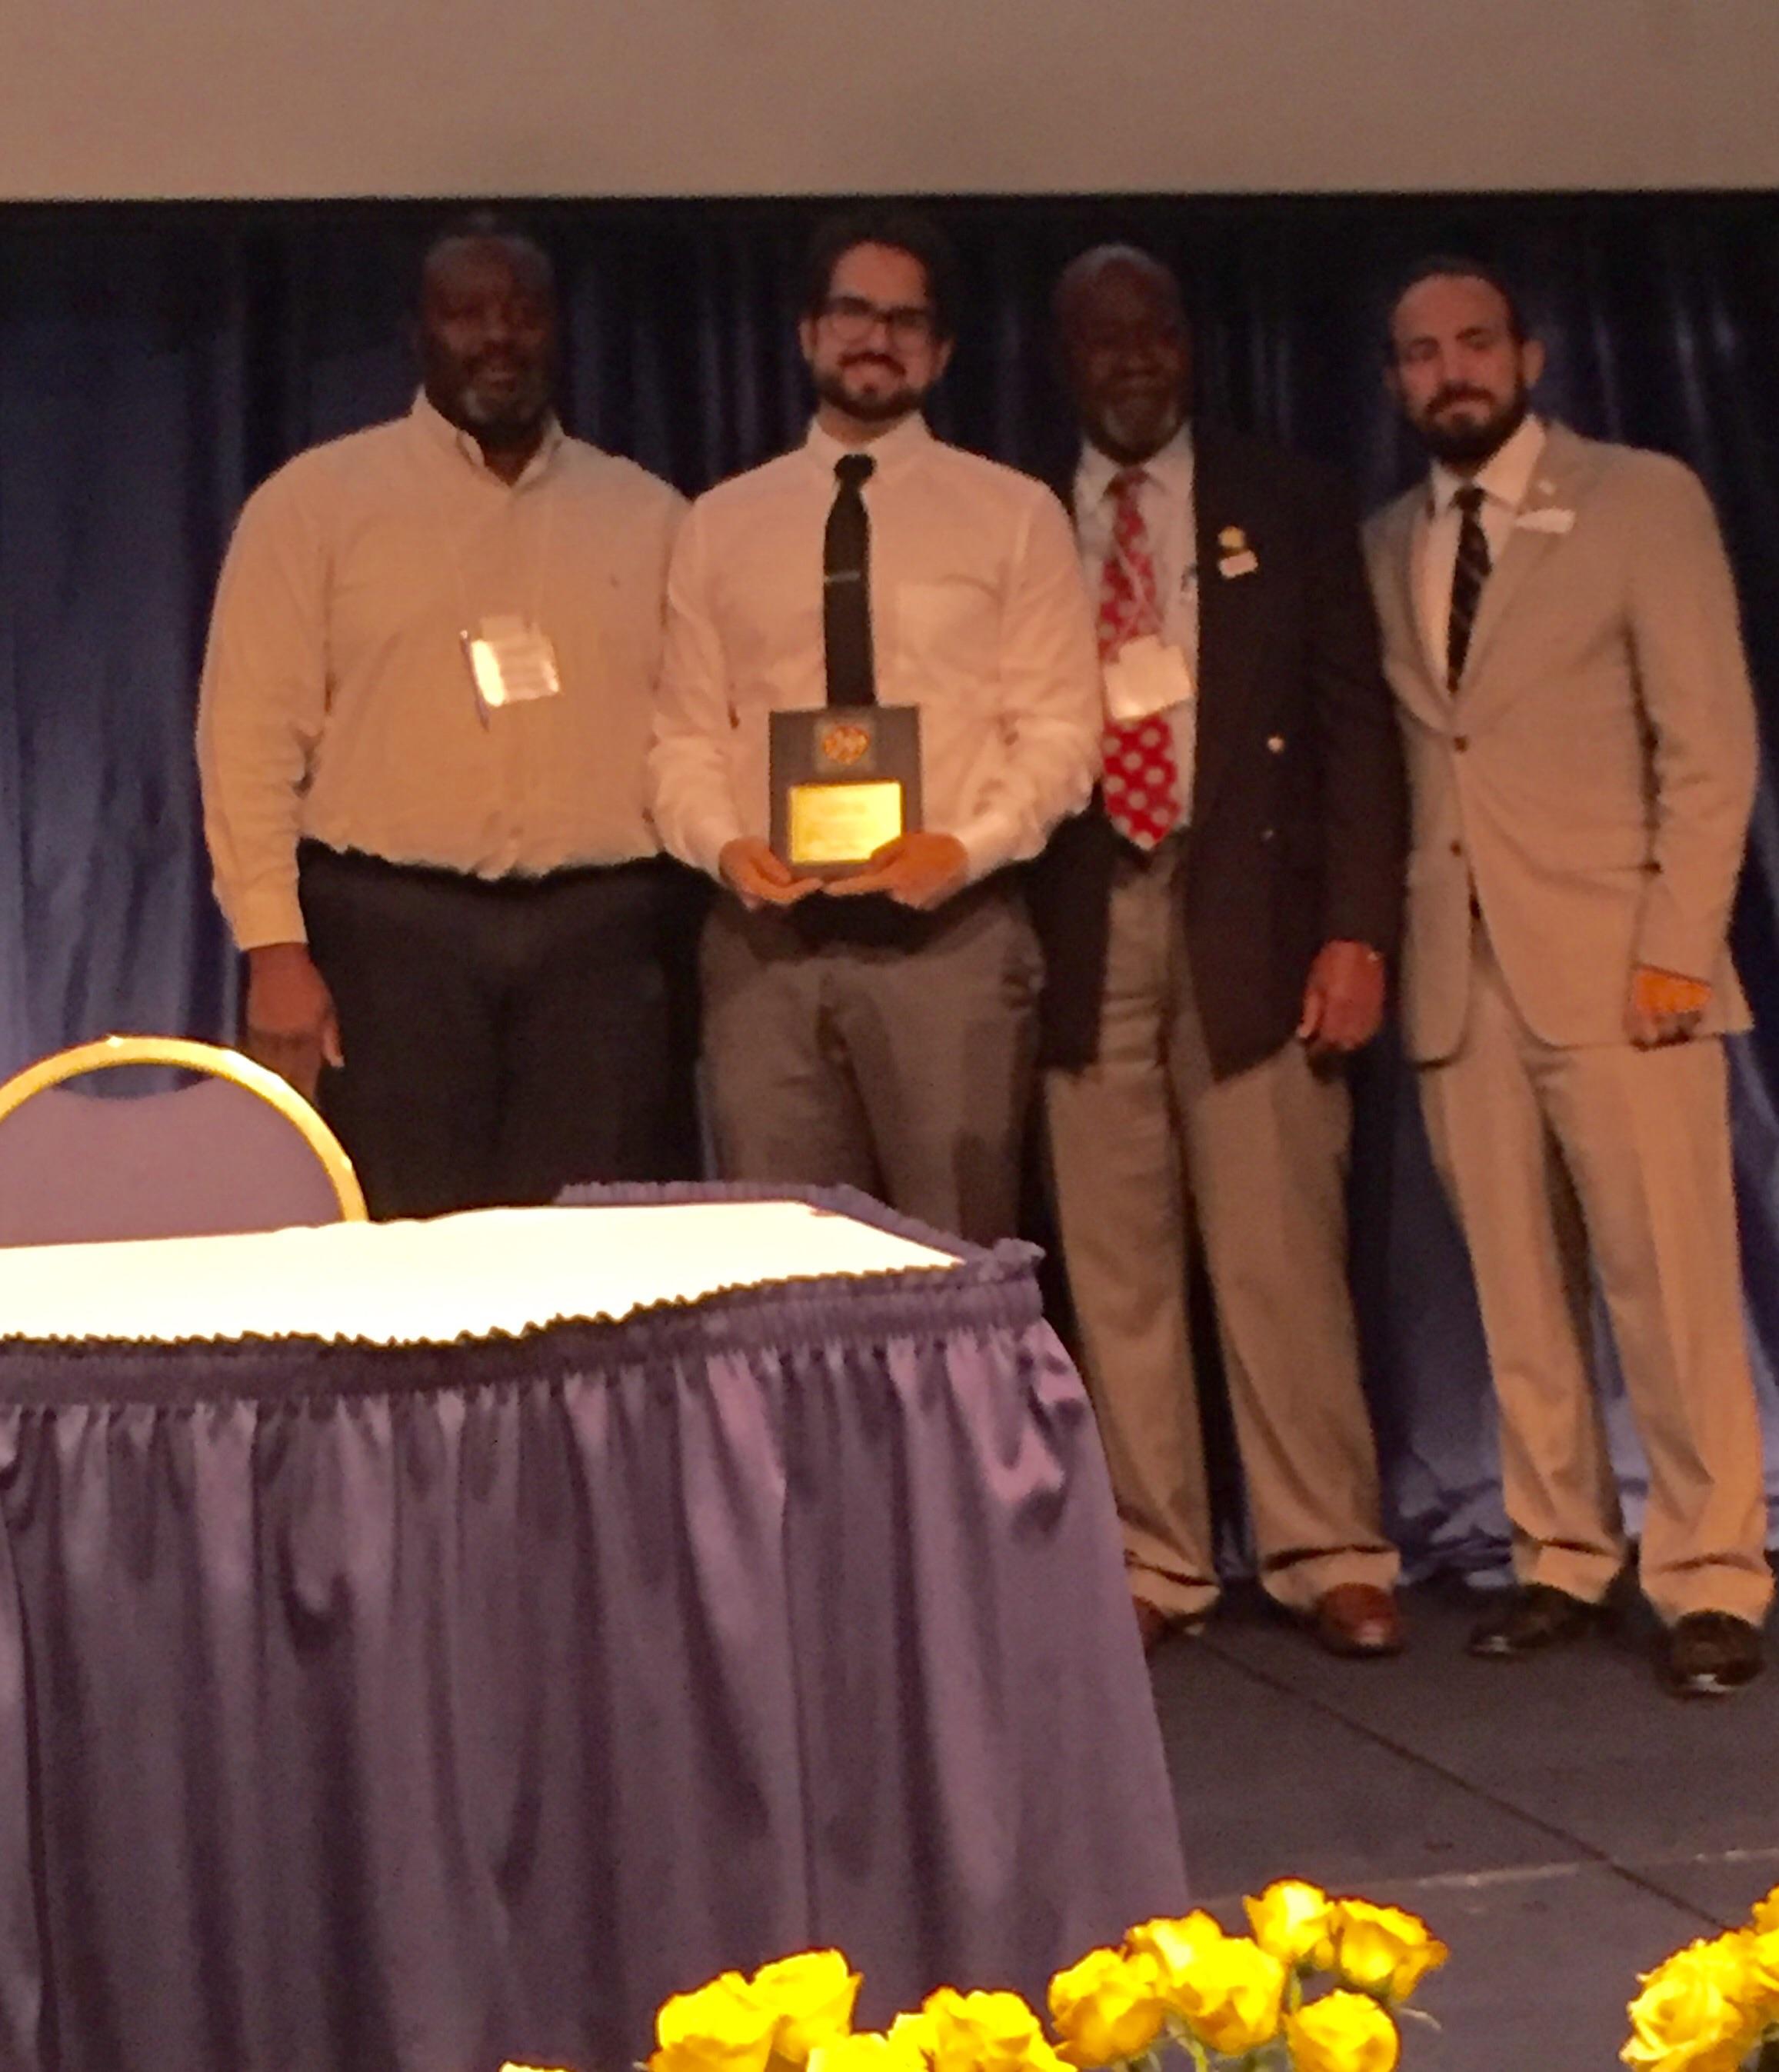 Reinier accepting his award